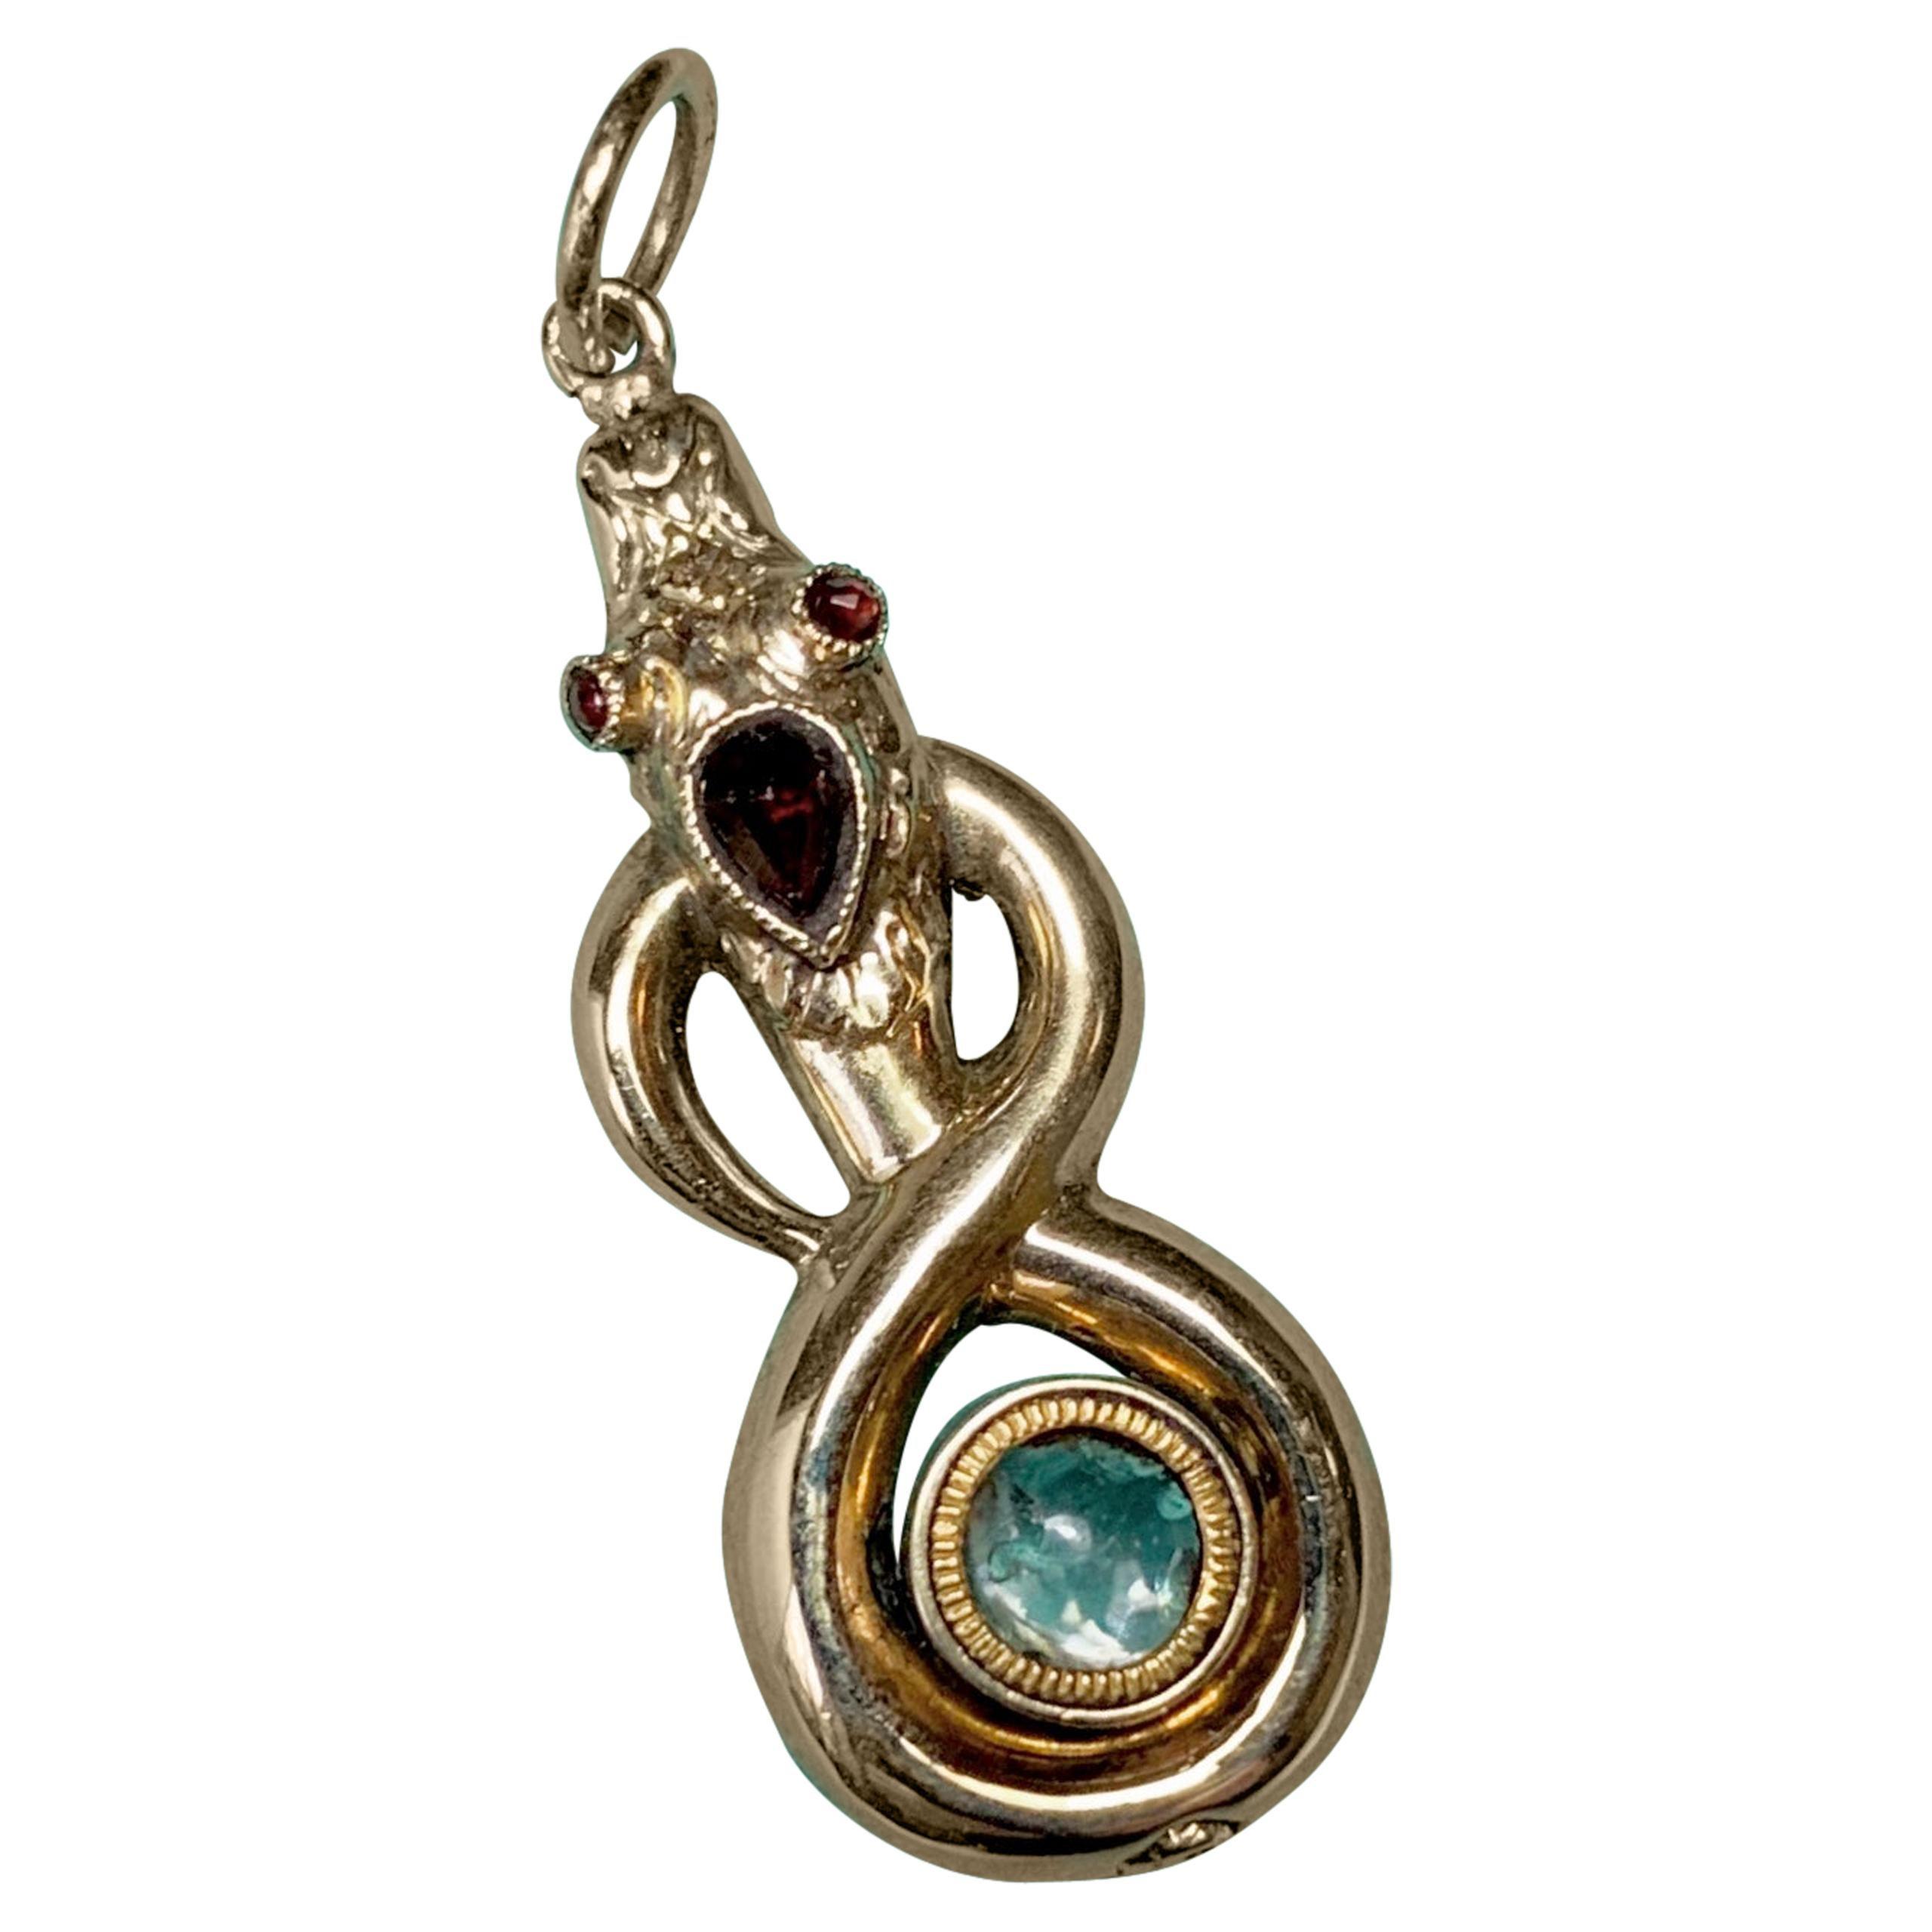 Georgian Snake Poison Locket Pendant Mourning Garnet Antique Gold 1800 Rare